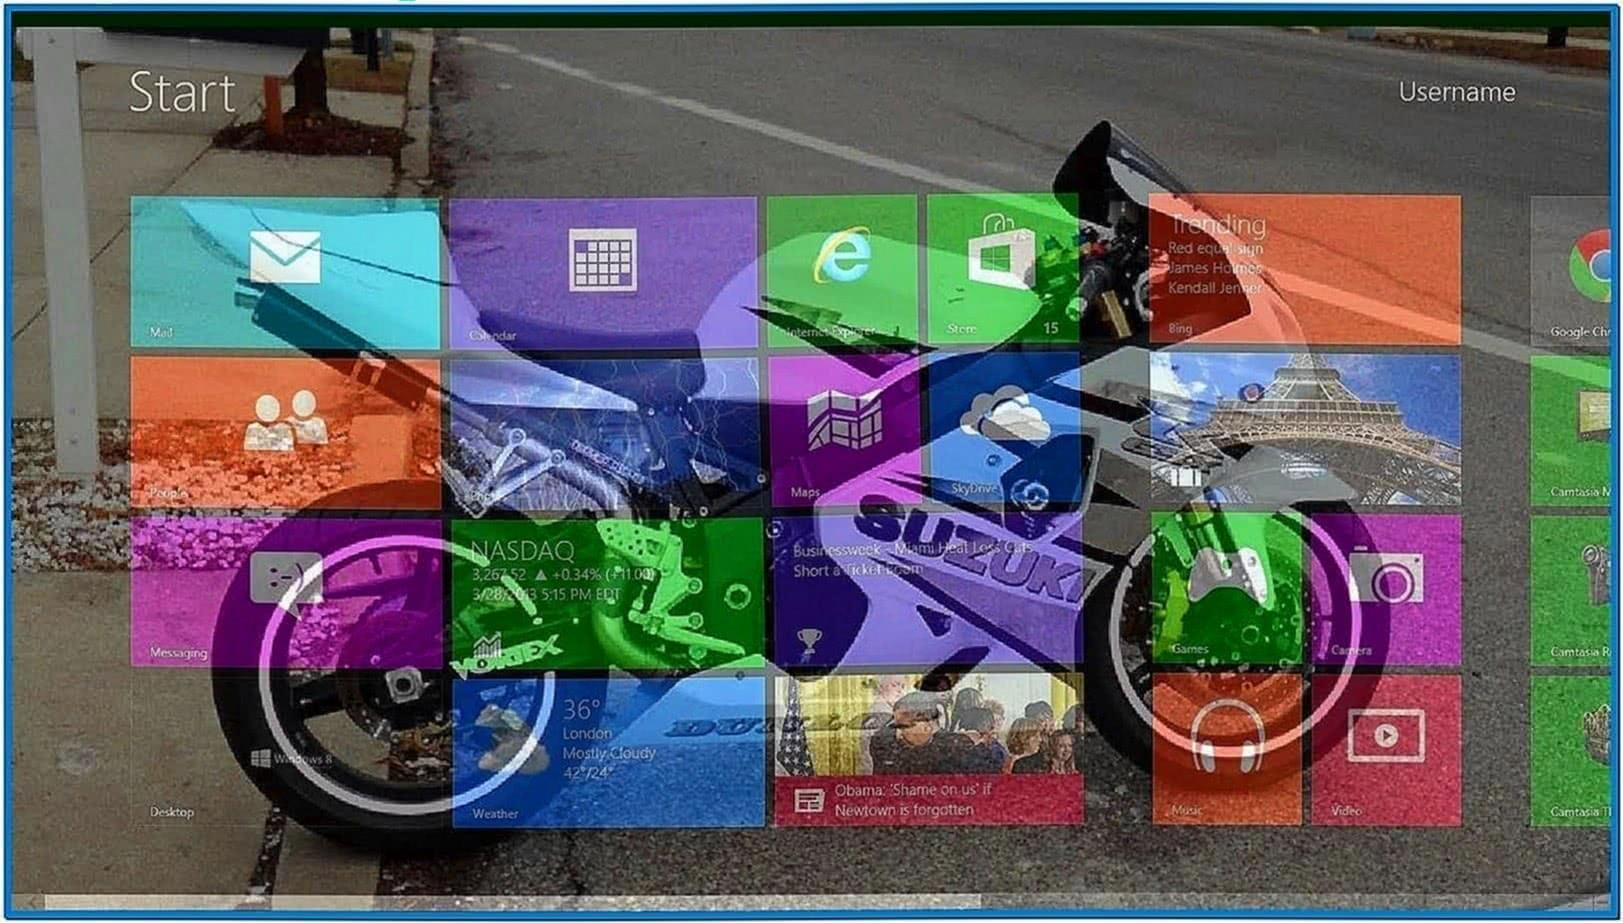 Convert Video to Screensaver Windows 8